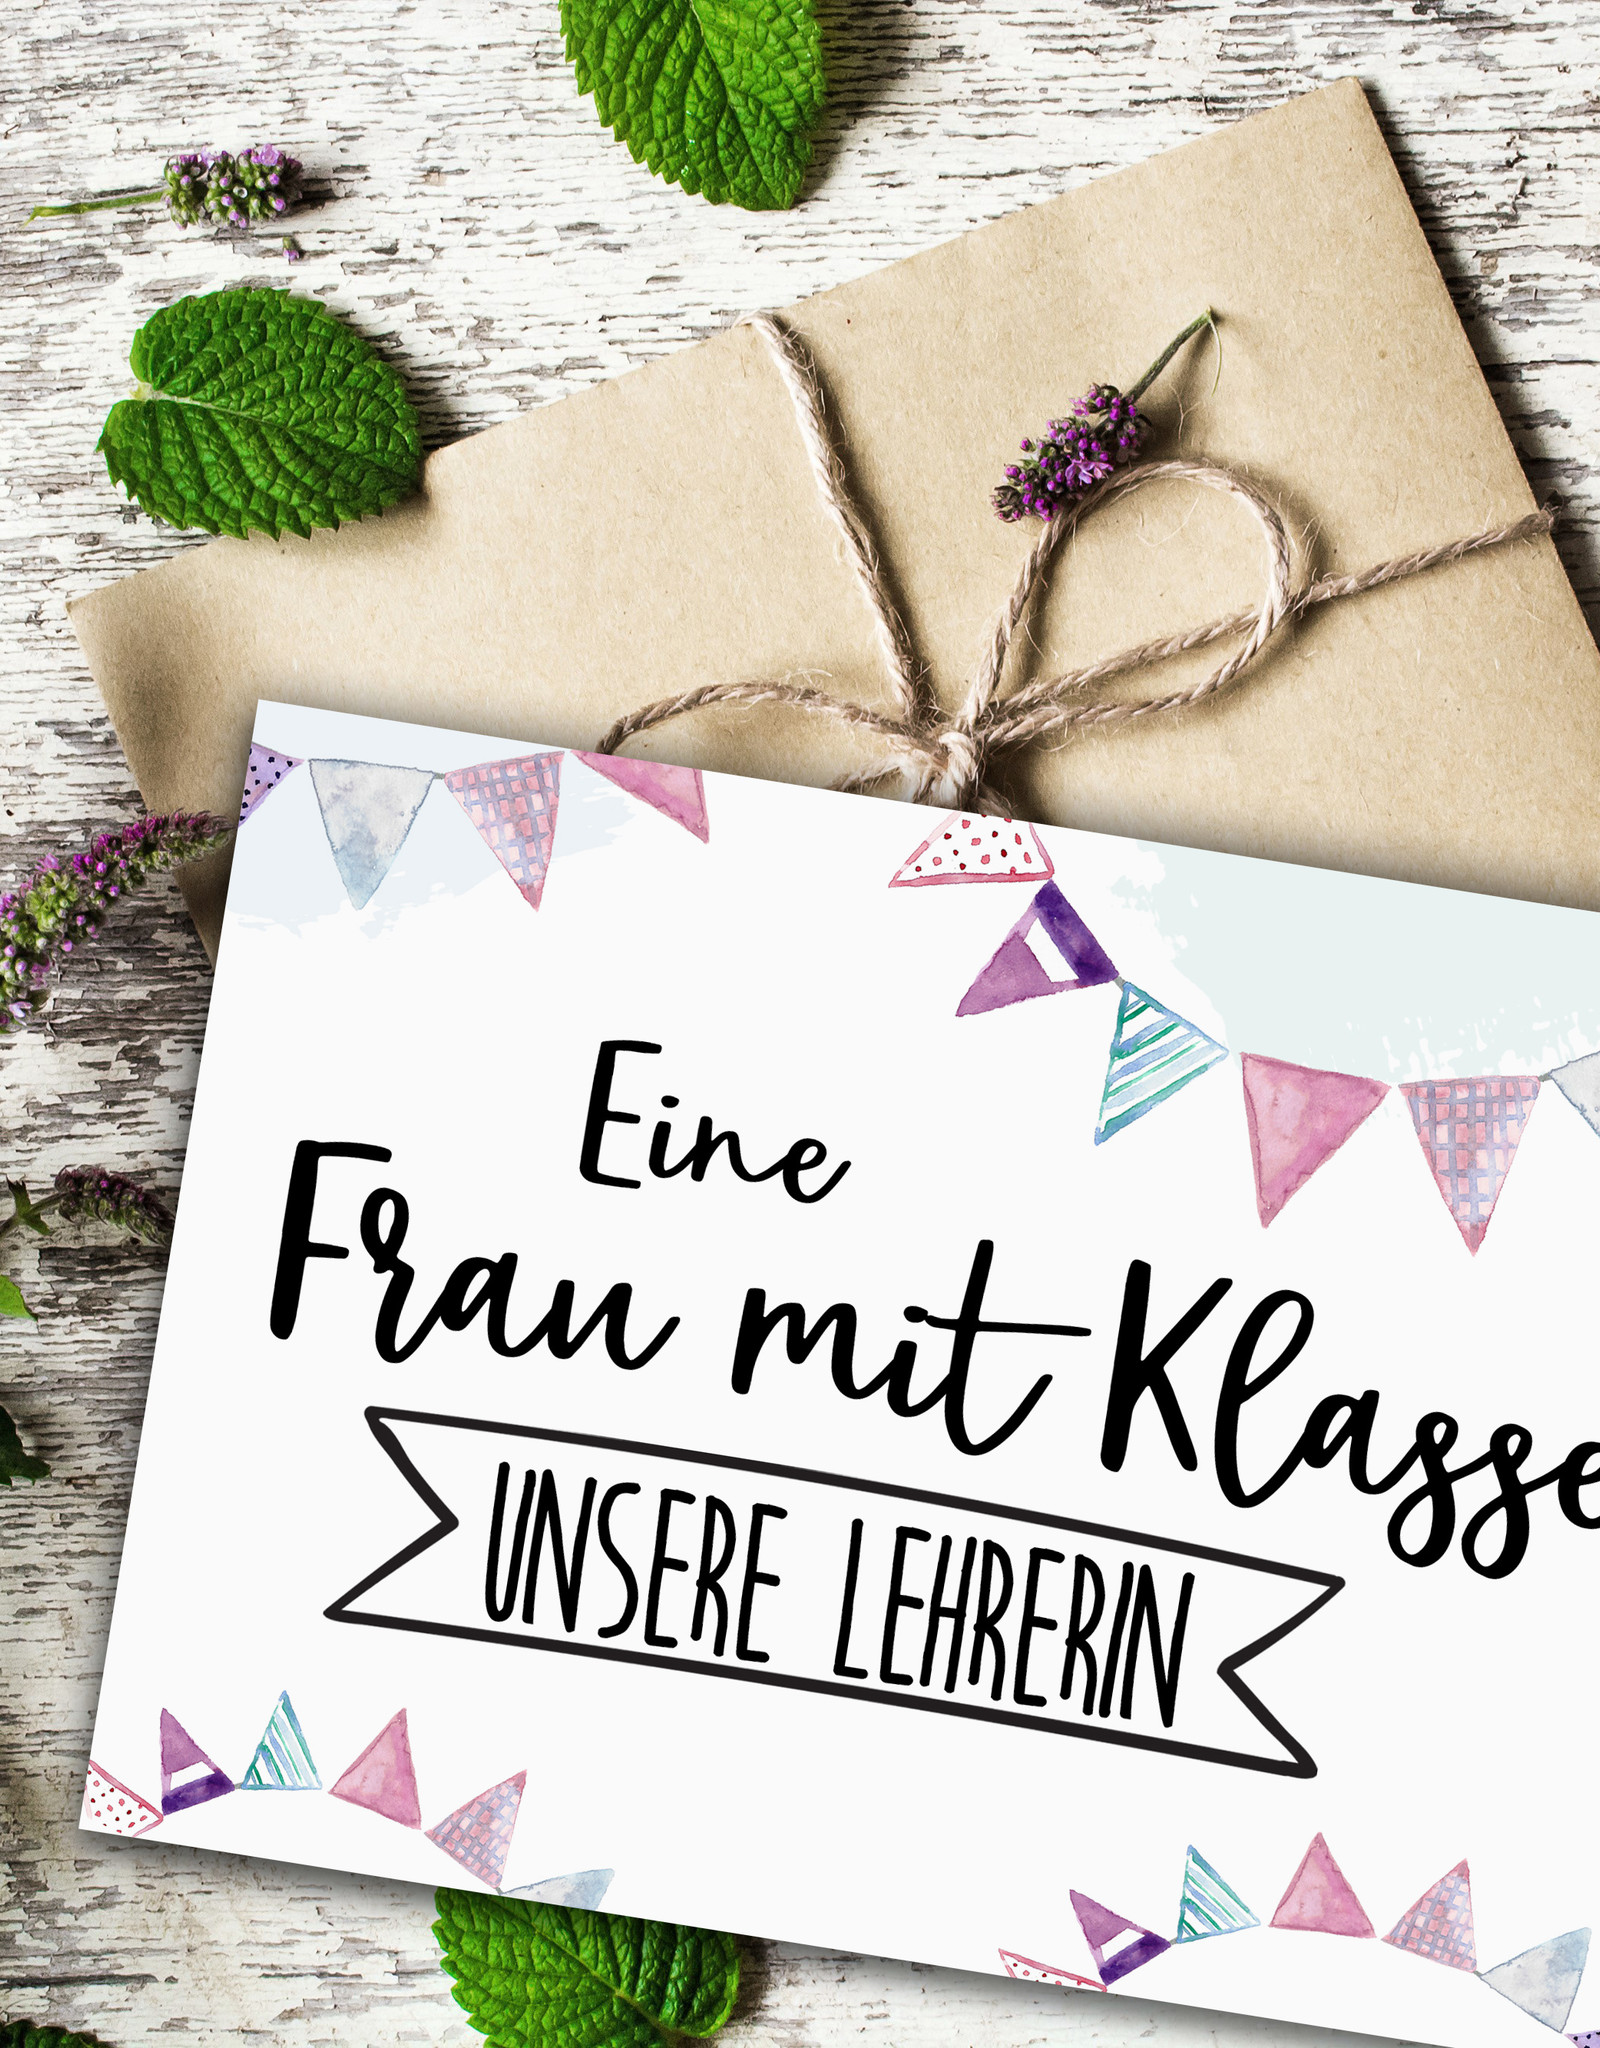 Postkarte Frau mit Klasse LEHRERIN Geschenk Postkarte